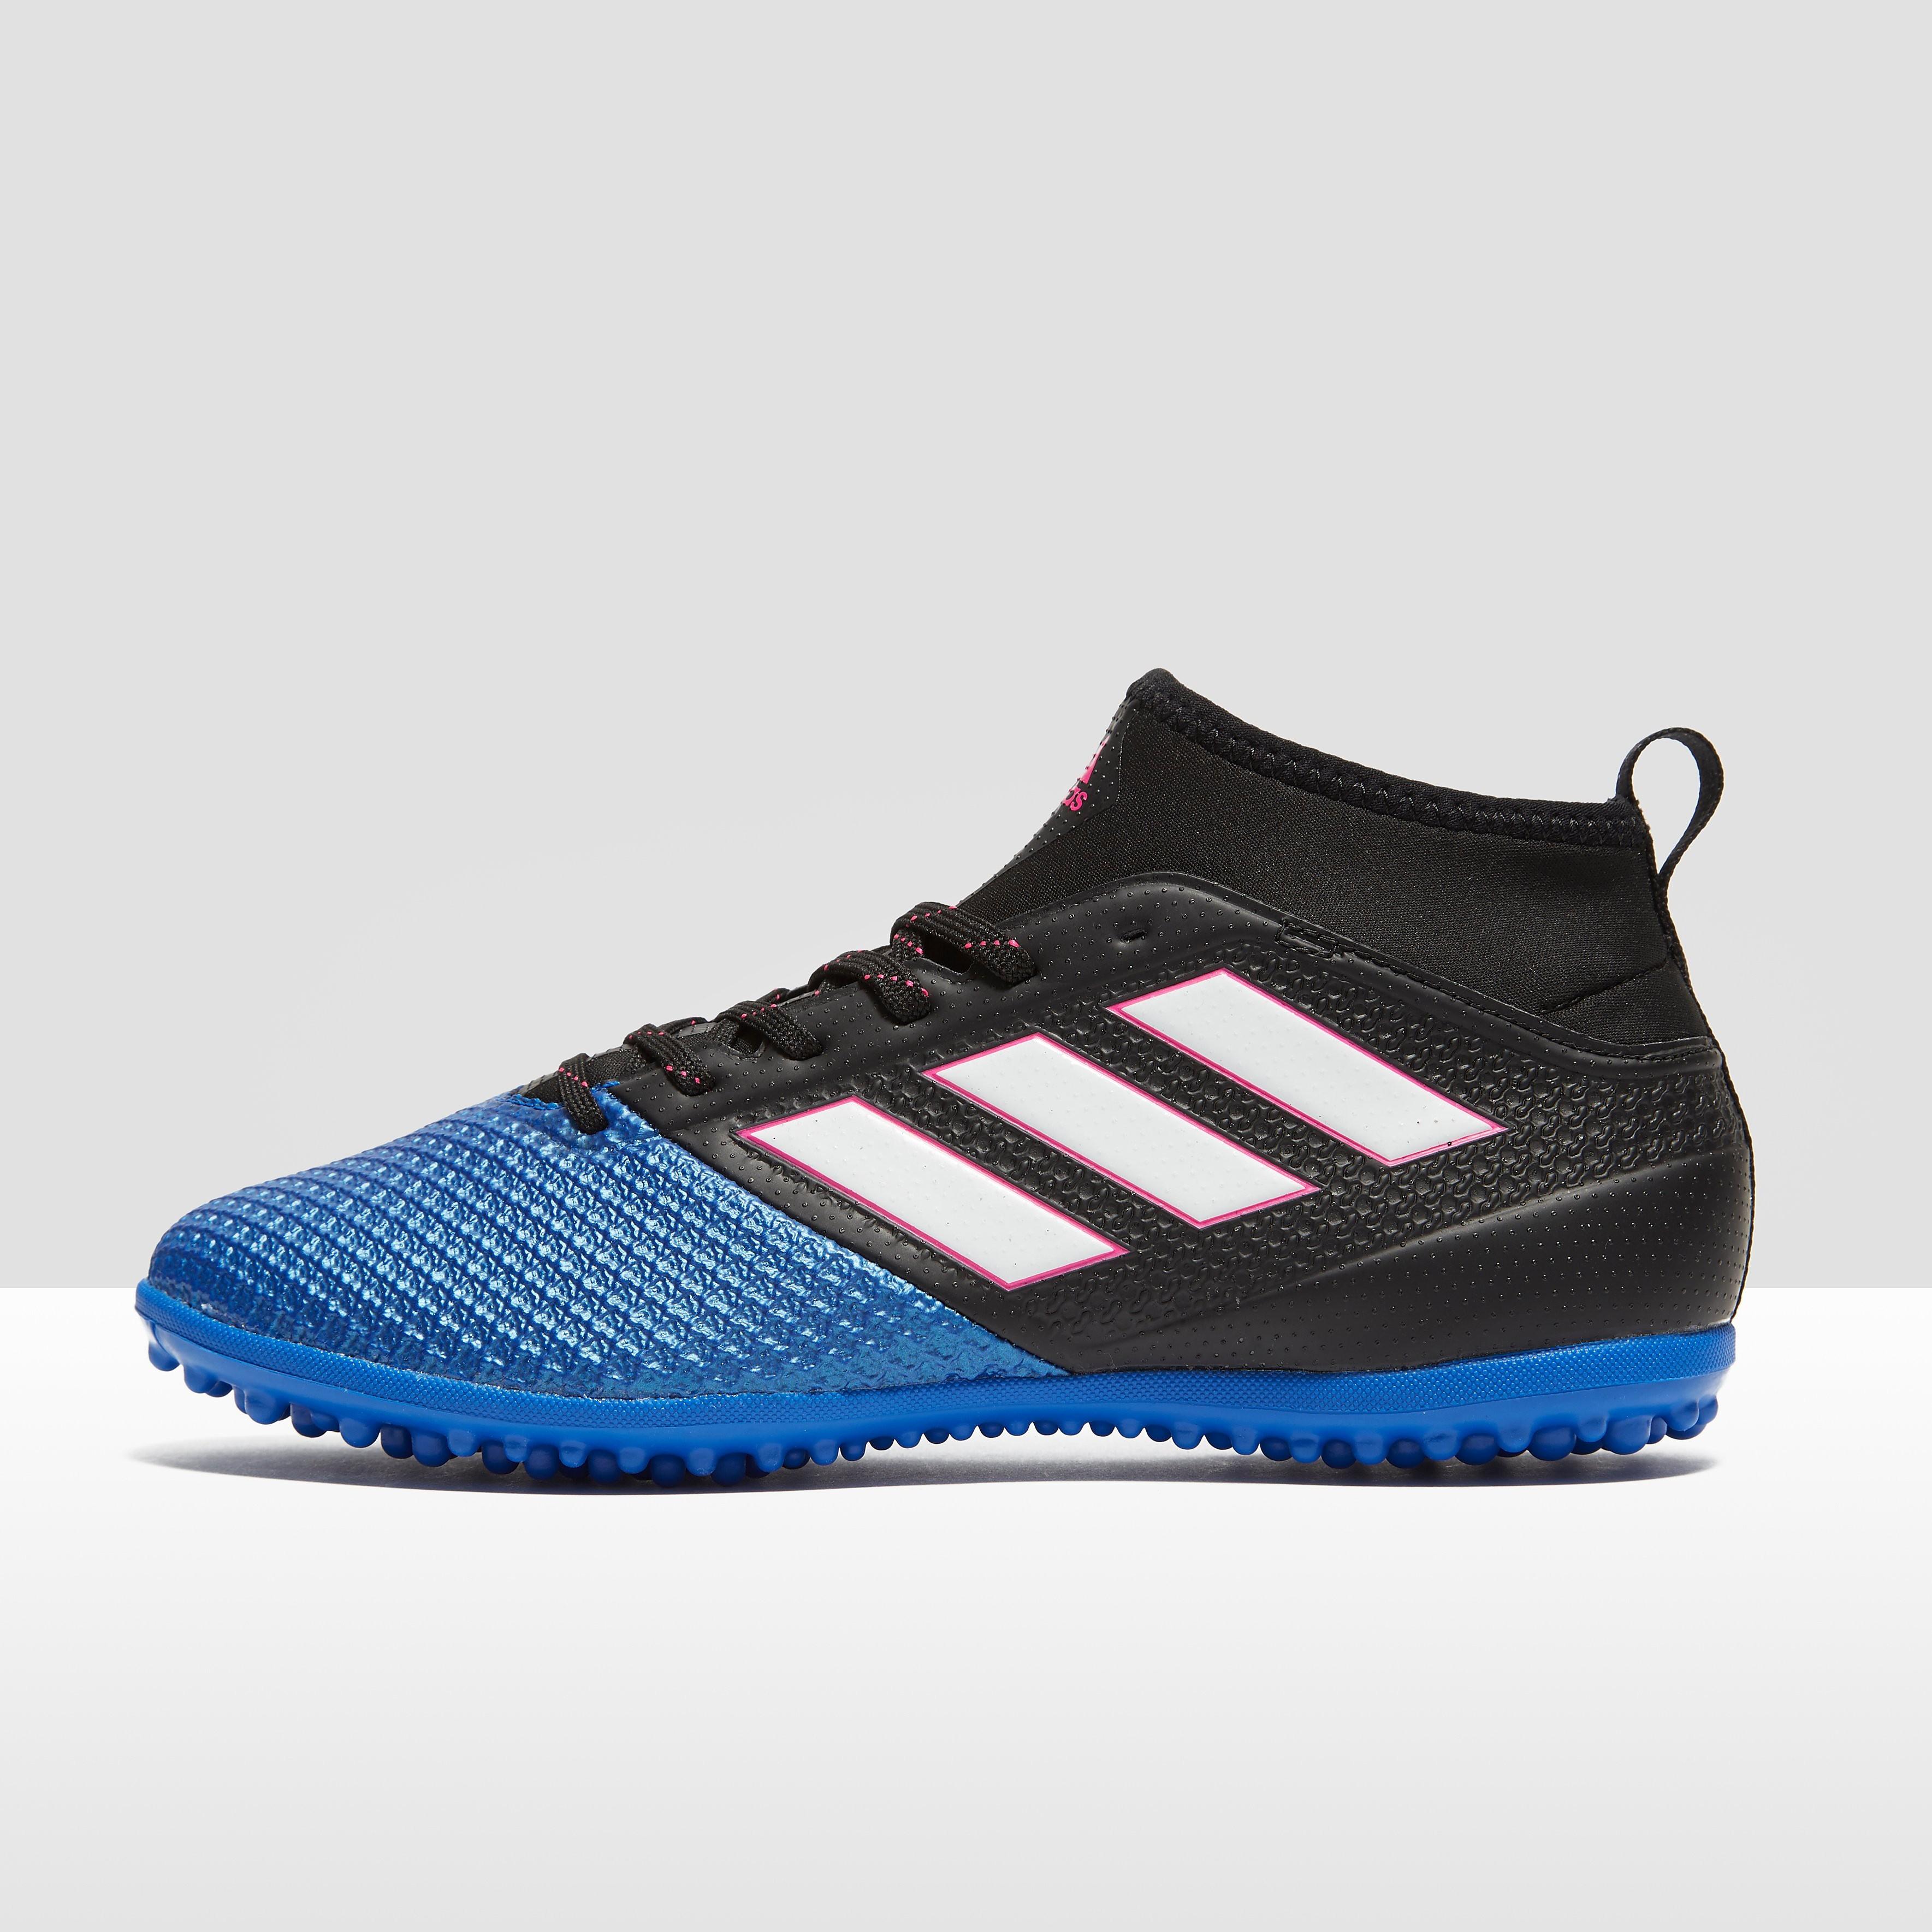 adidas Blue Blast ACE 17.3 Primemesh Turf Men's Football Boots